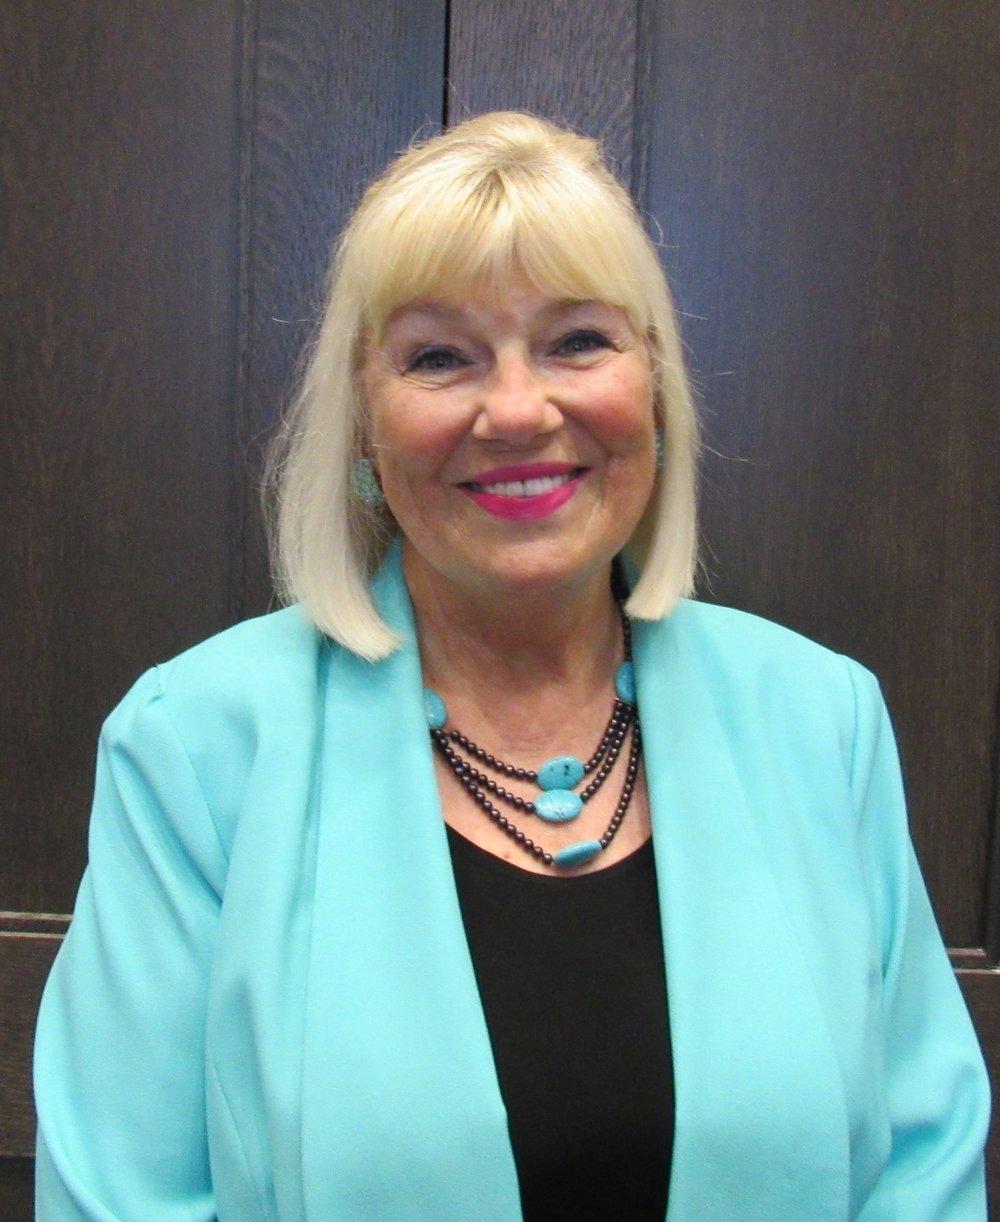 Mrs. Jody Capehart